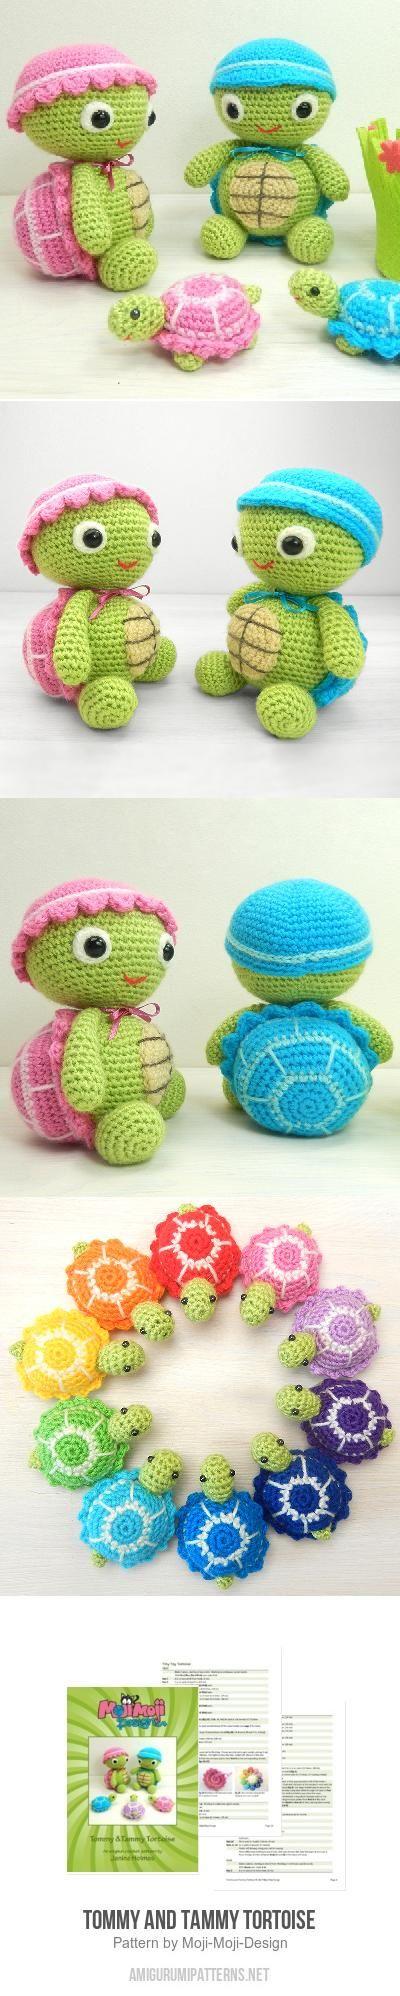 Tommy and Tammy Tortoise amigurumi pattern